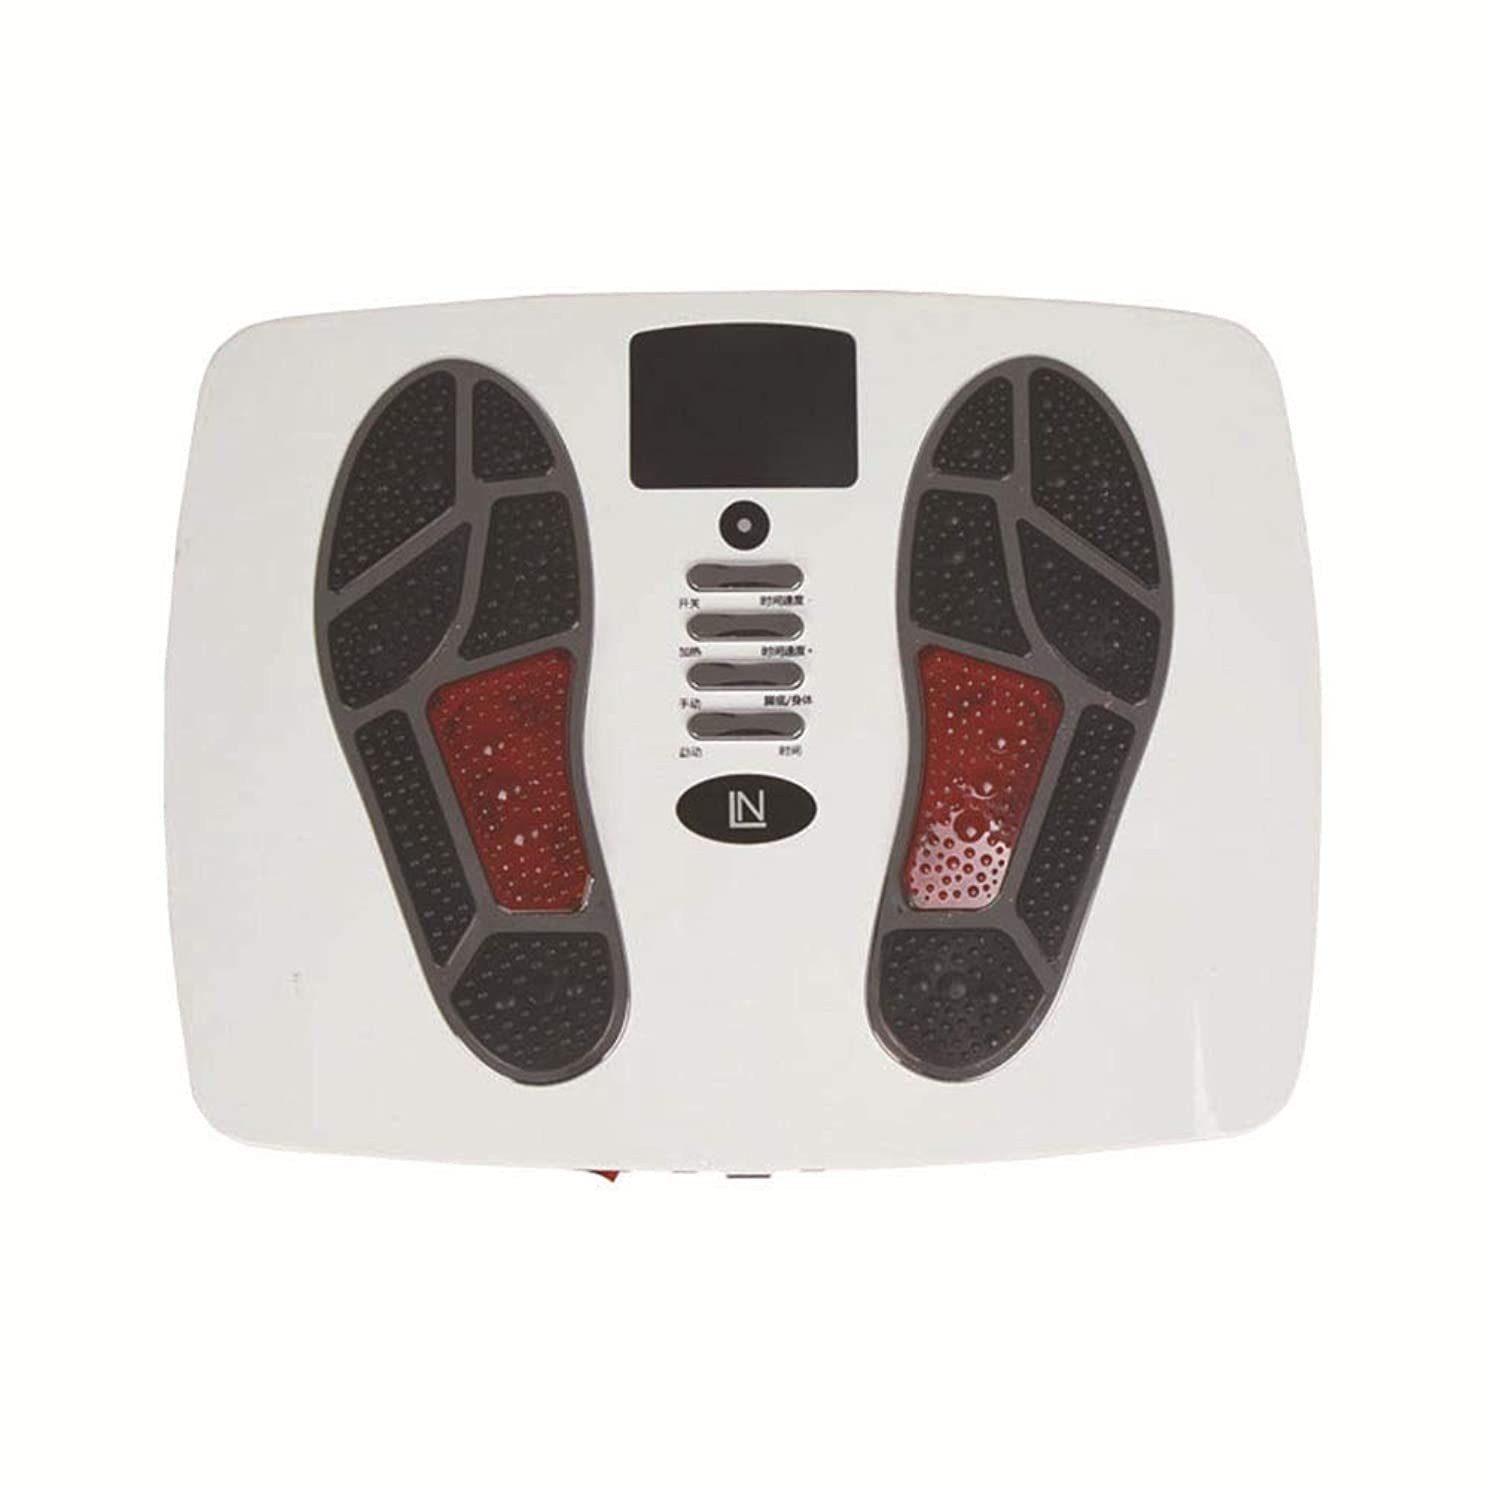 Circulation Booster、体を刺激する99の強度設定、赤外線機能、フットケア、ストレス解消